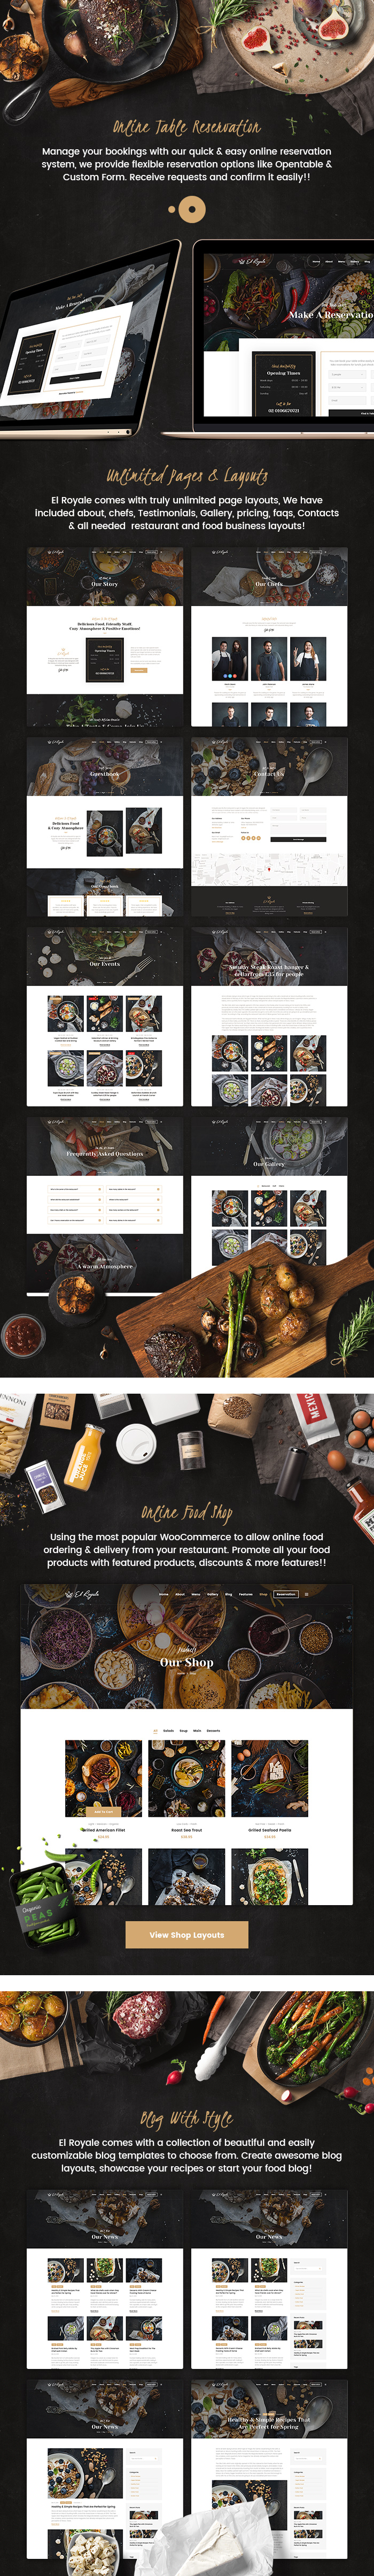 Elroyale - Restaurant & Cafe HTML5 Template - 3